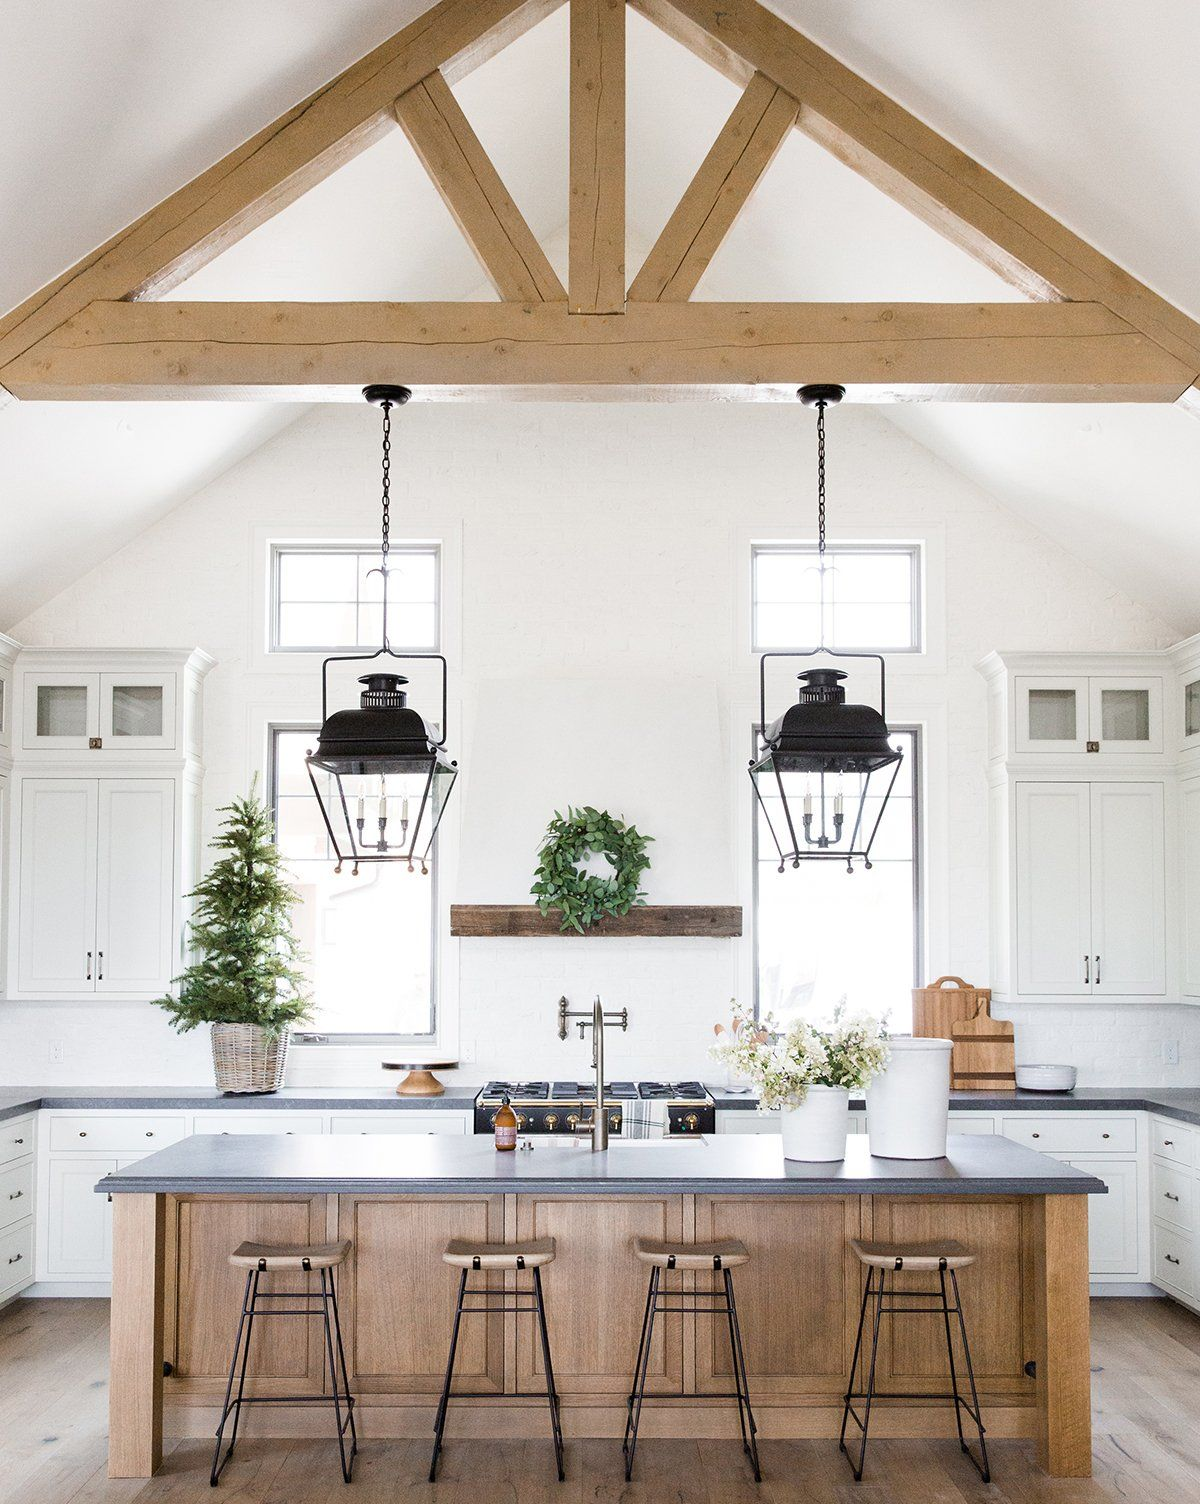 crackle cream planter large farmhouse kitchen decor farmhouse style kitchen modern on farmhouse kitchen kitchen id=76880